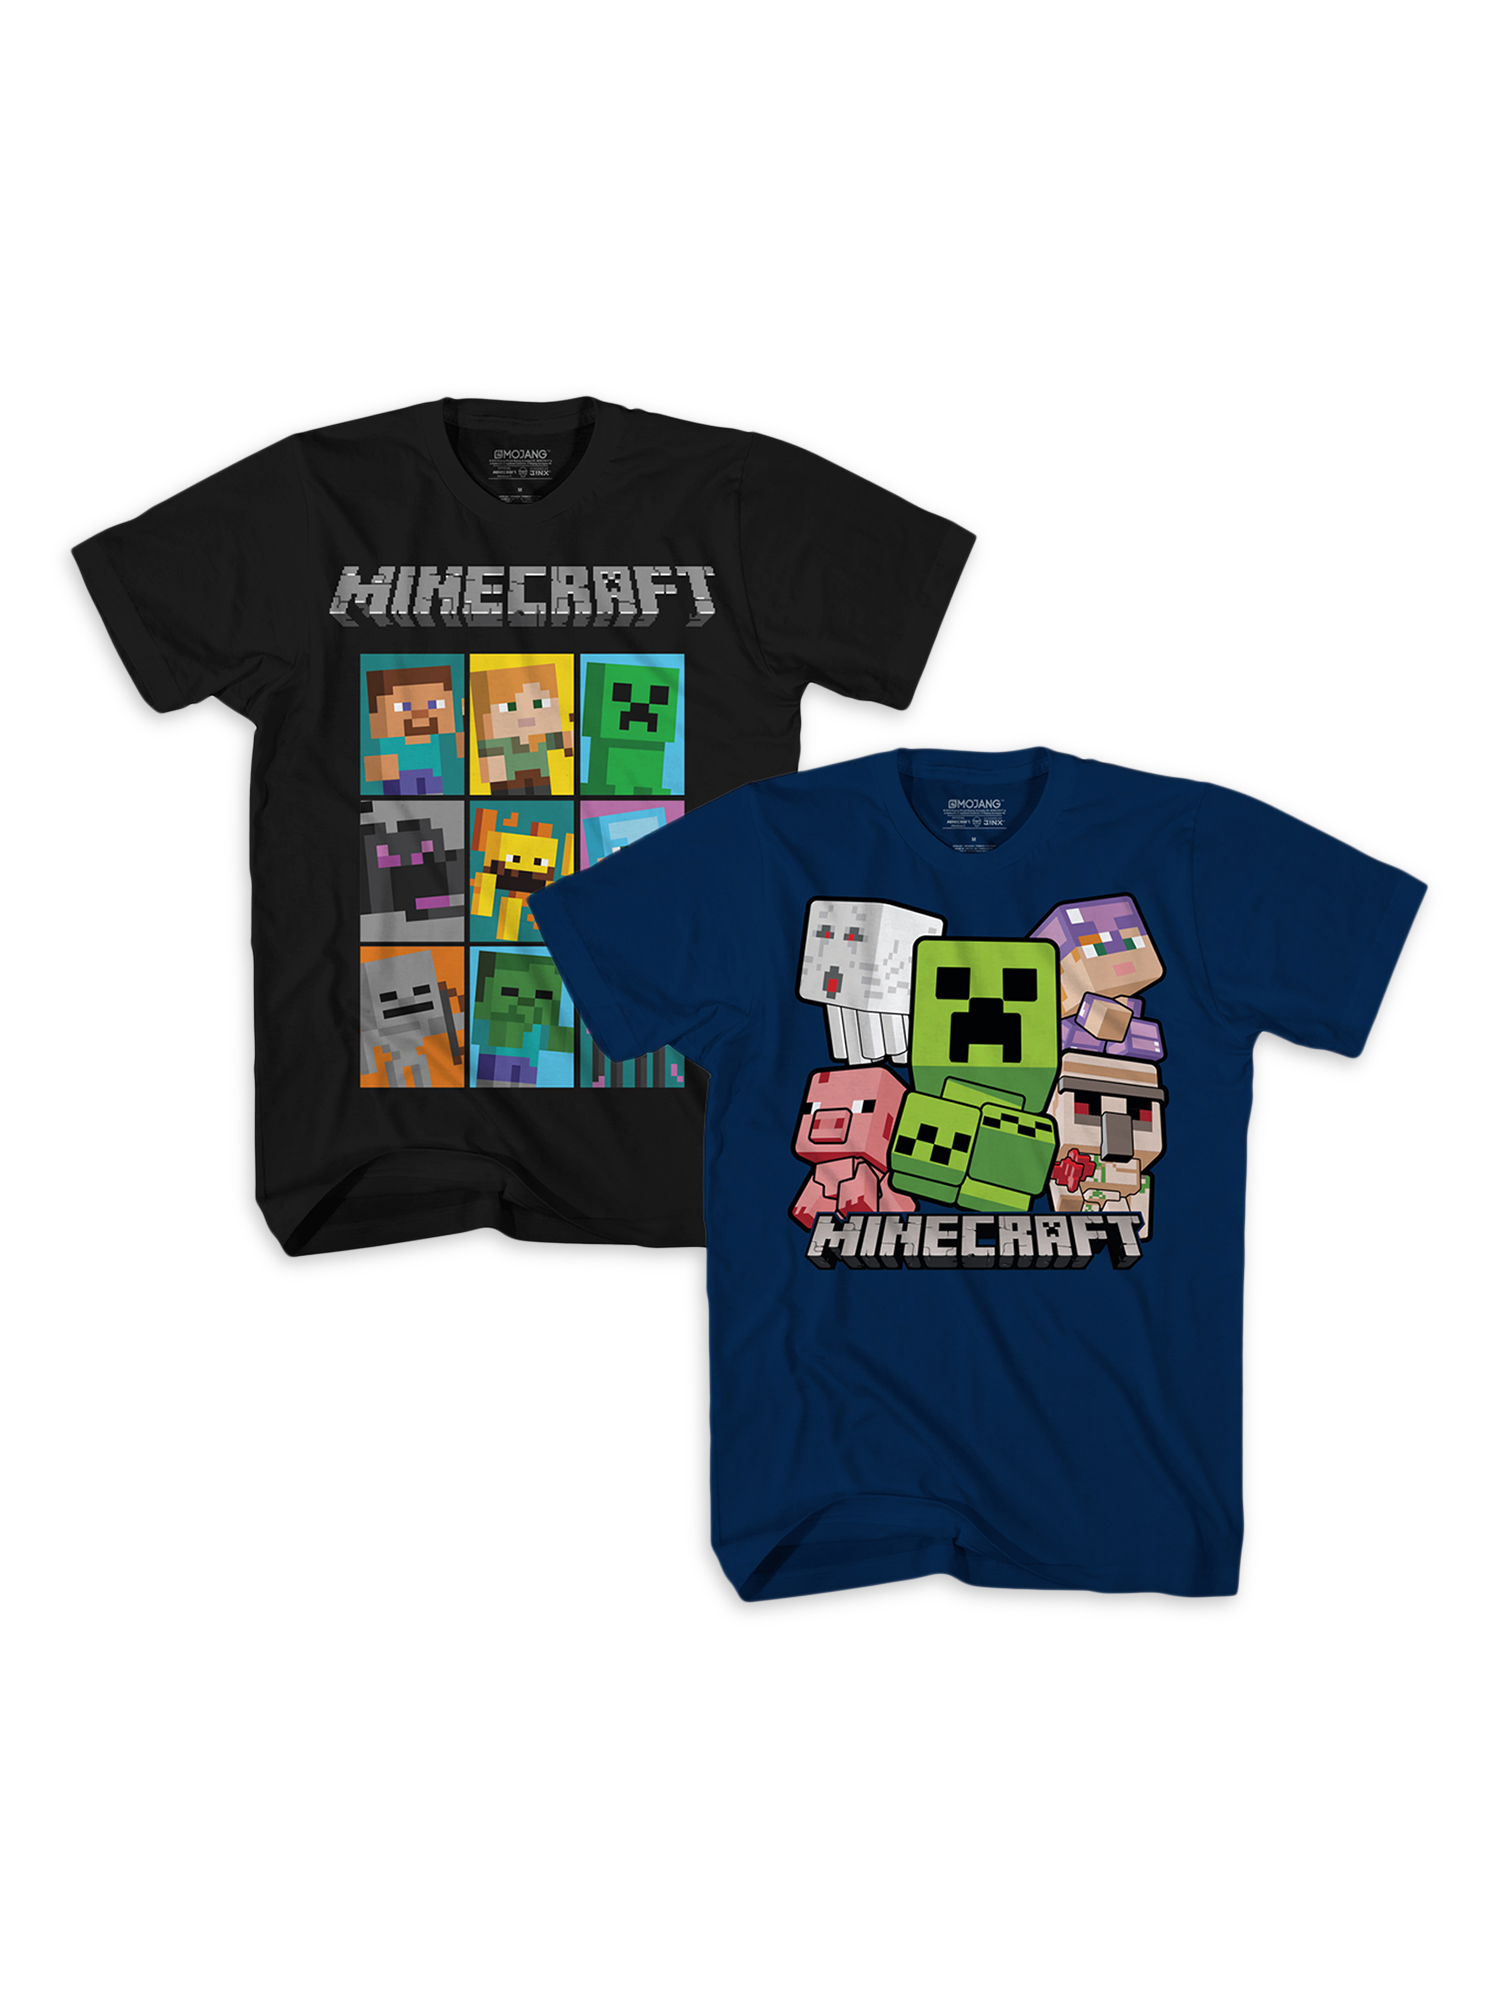 MINECRAFT CREEPER T-Shirt Girl/'s Youth Size S Small 6-6x NEW Mojang JINX